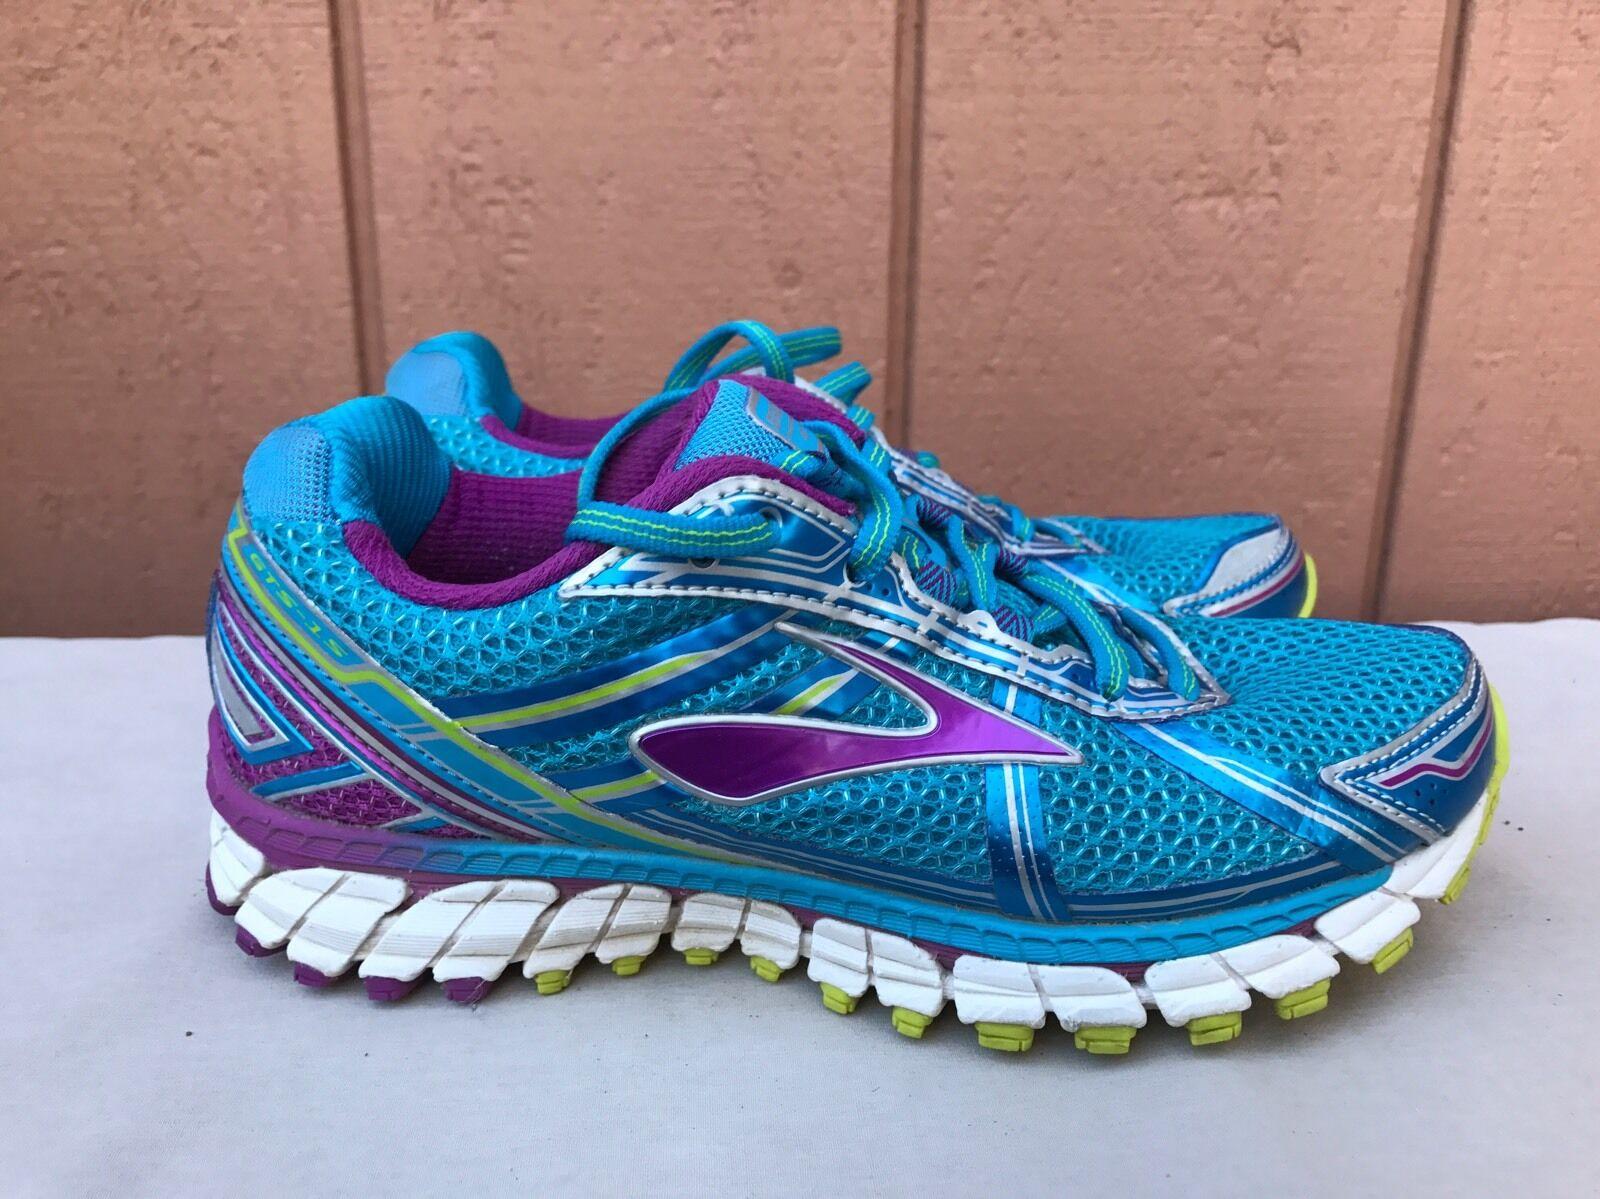 Menta Brooks Mujer Adrenaline GTS 15 Azul Morado Running zapatos nos 6.5B 37.5 euros